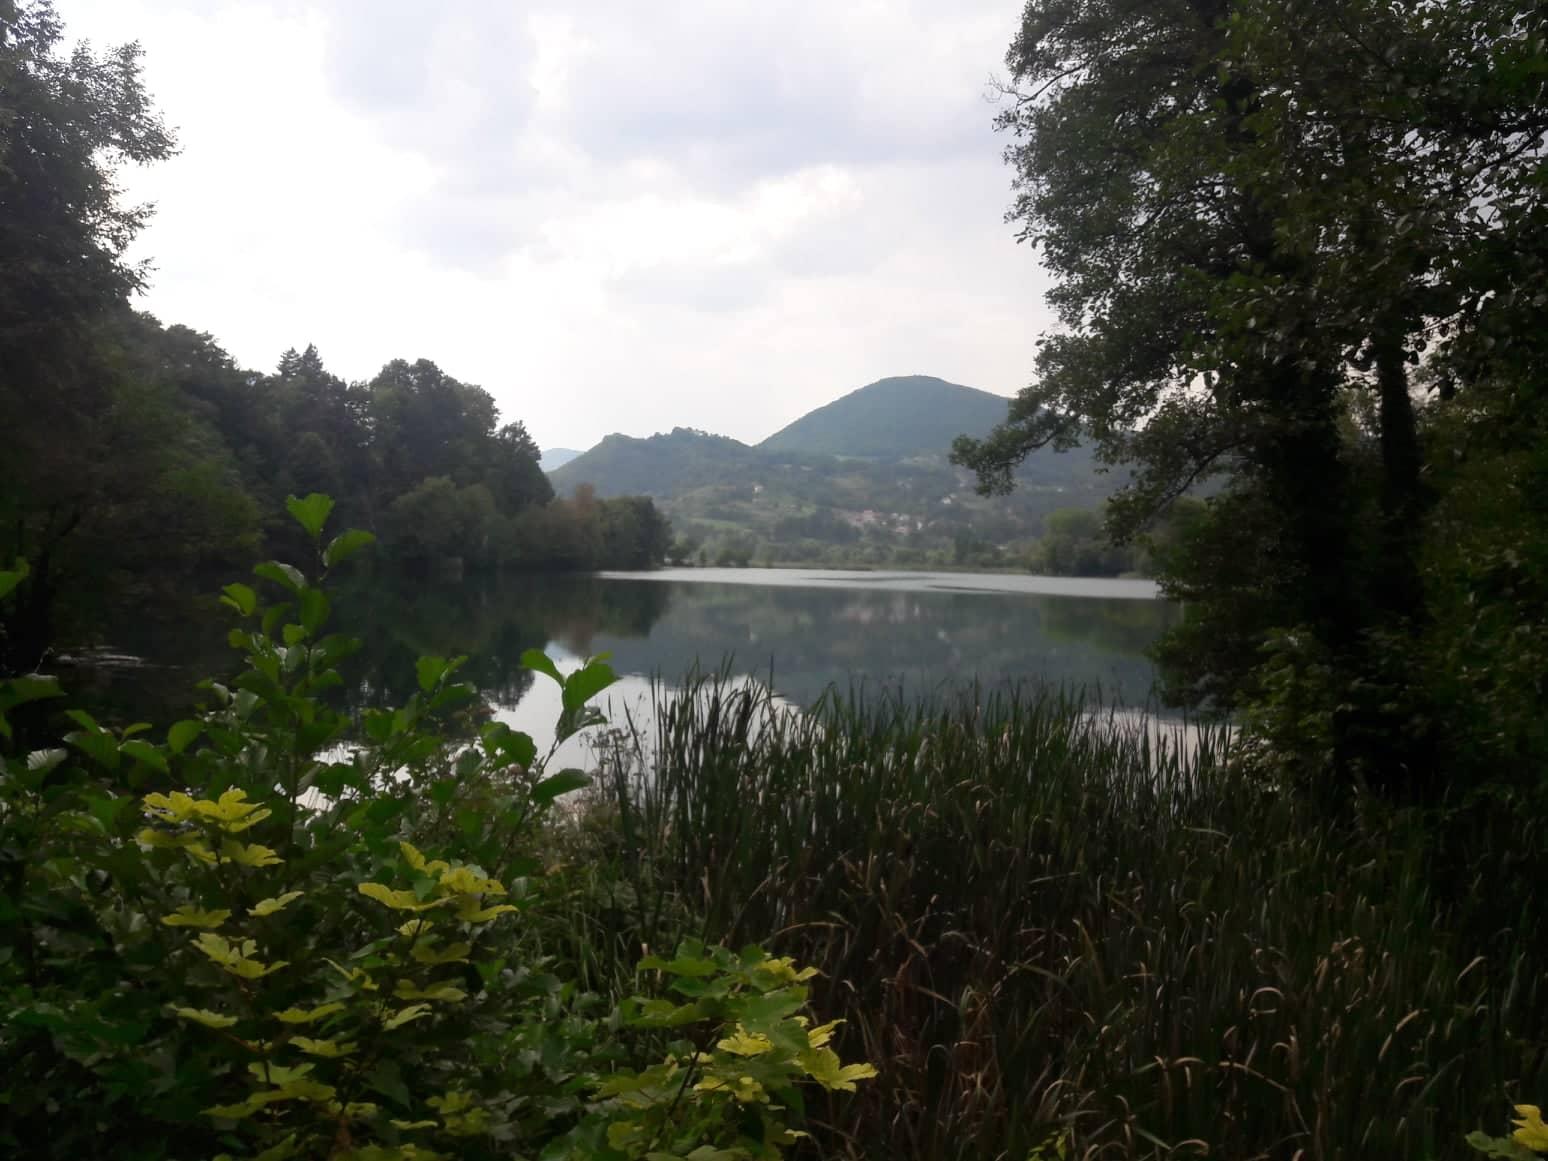 Exploring Picturesque Plivsko jezero, near Jajce